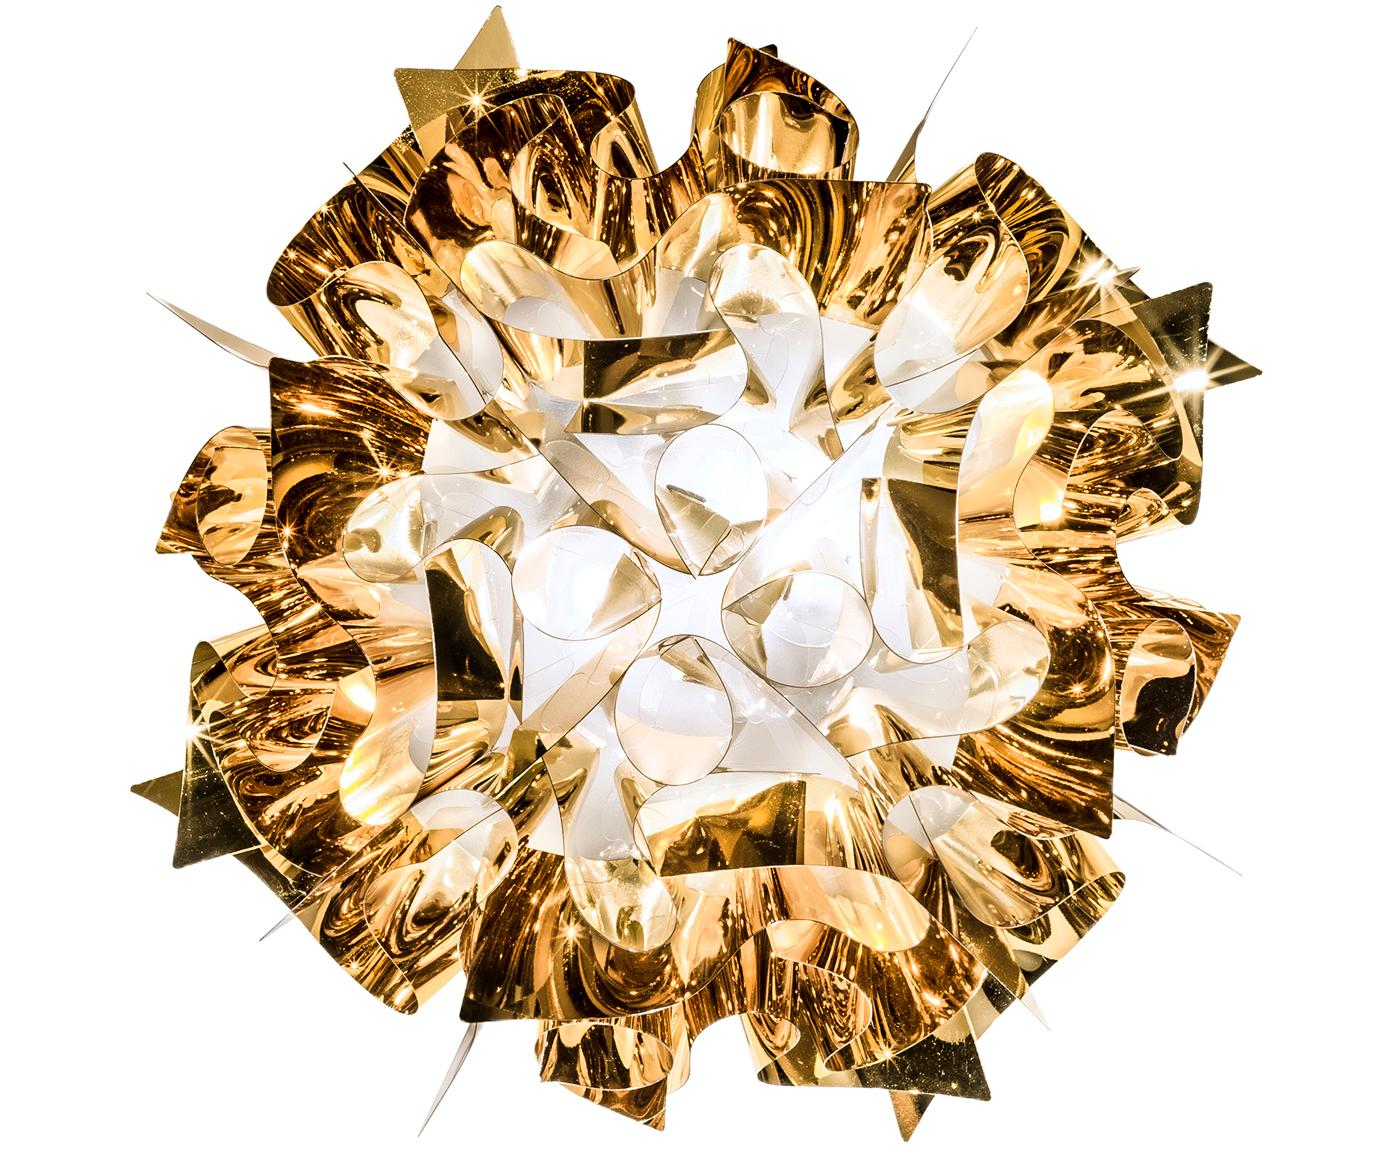 Handgemaakte Plafondlamp Veli, Technoplymeer Goldflex®, breekvast, flexibel, sterk glanzend, Goudkleurig, Ø 53 x H 20 cm